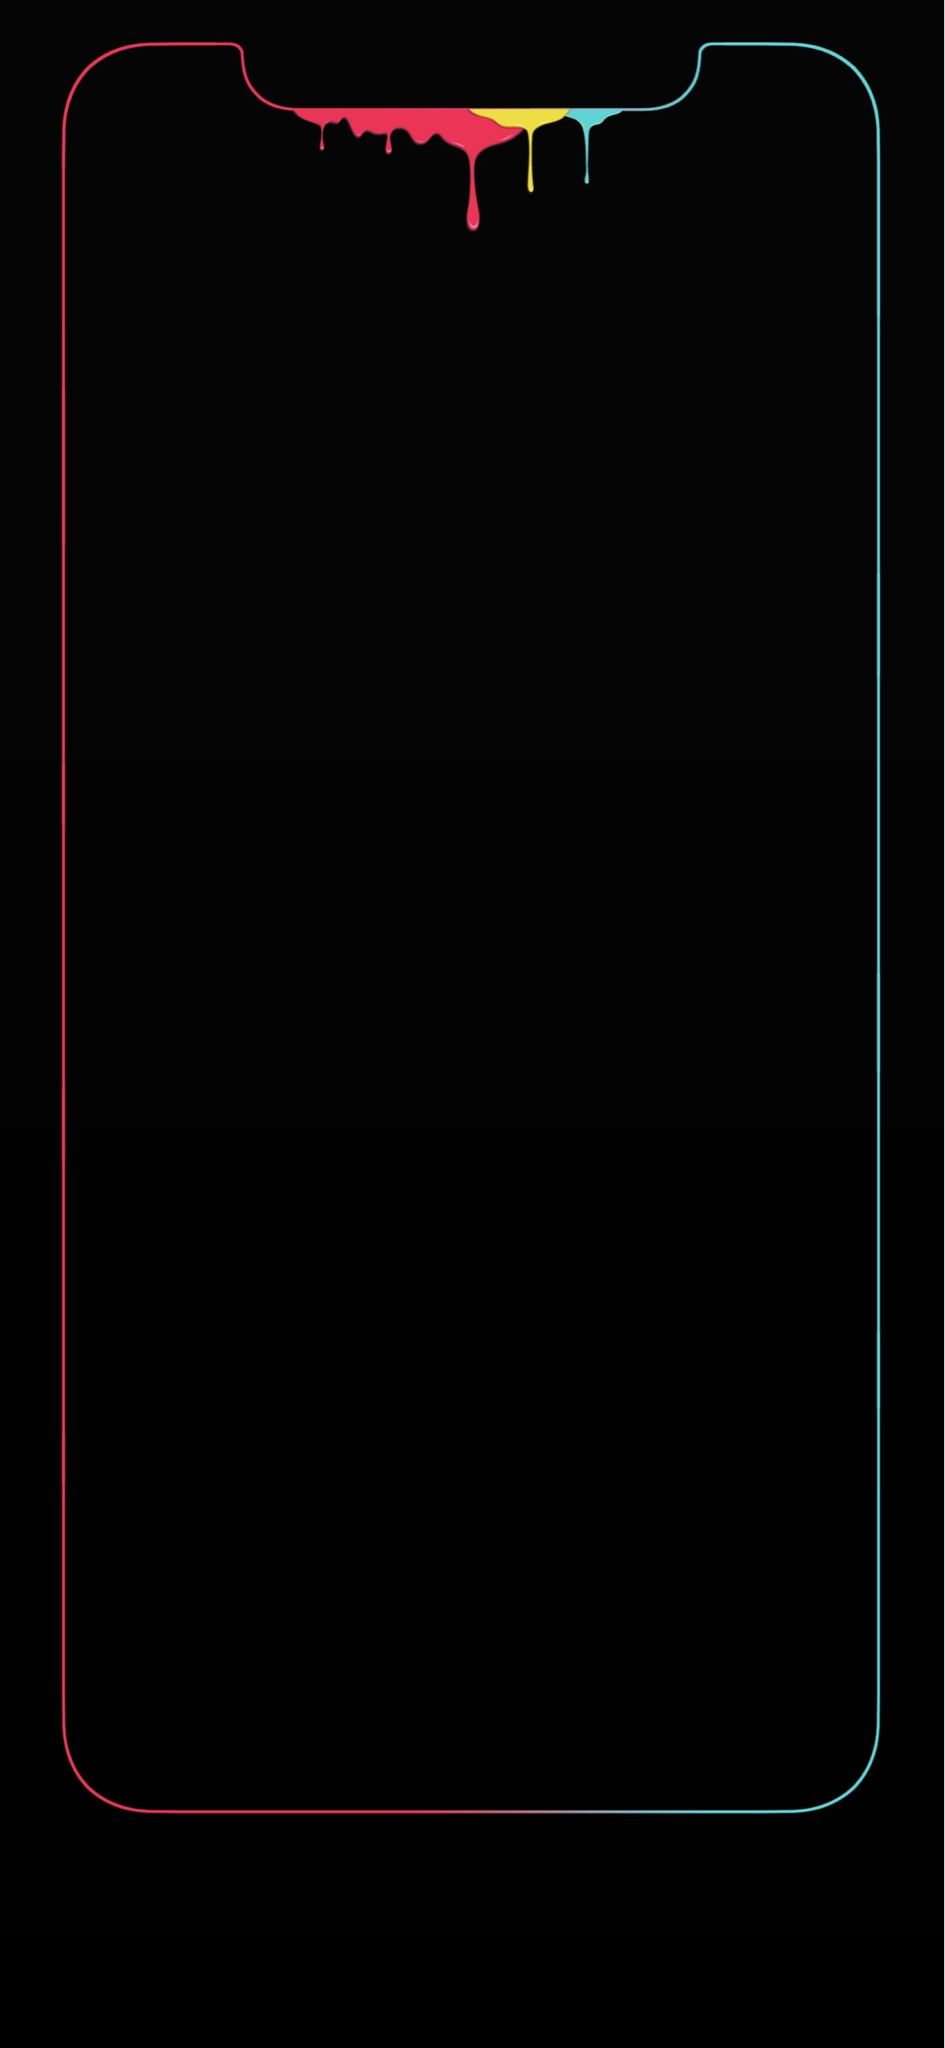 Iphone X Border Wallpaper Hd